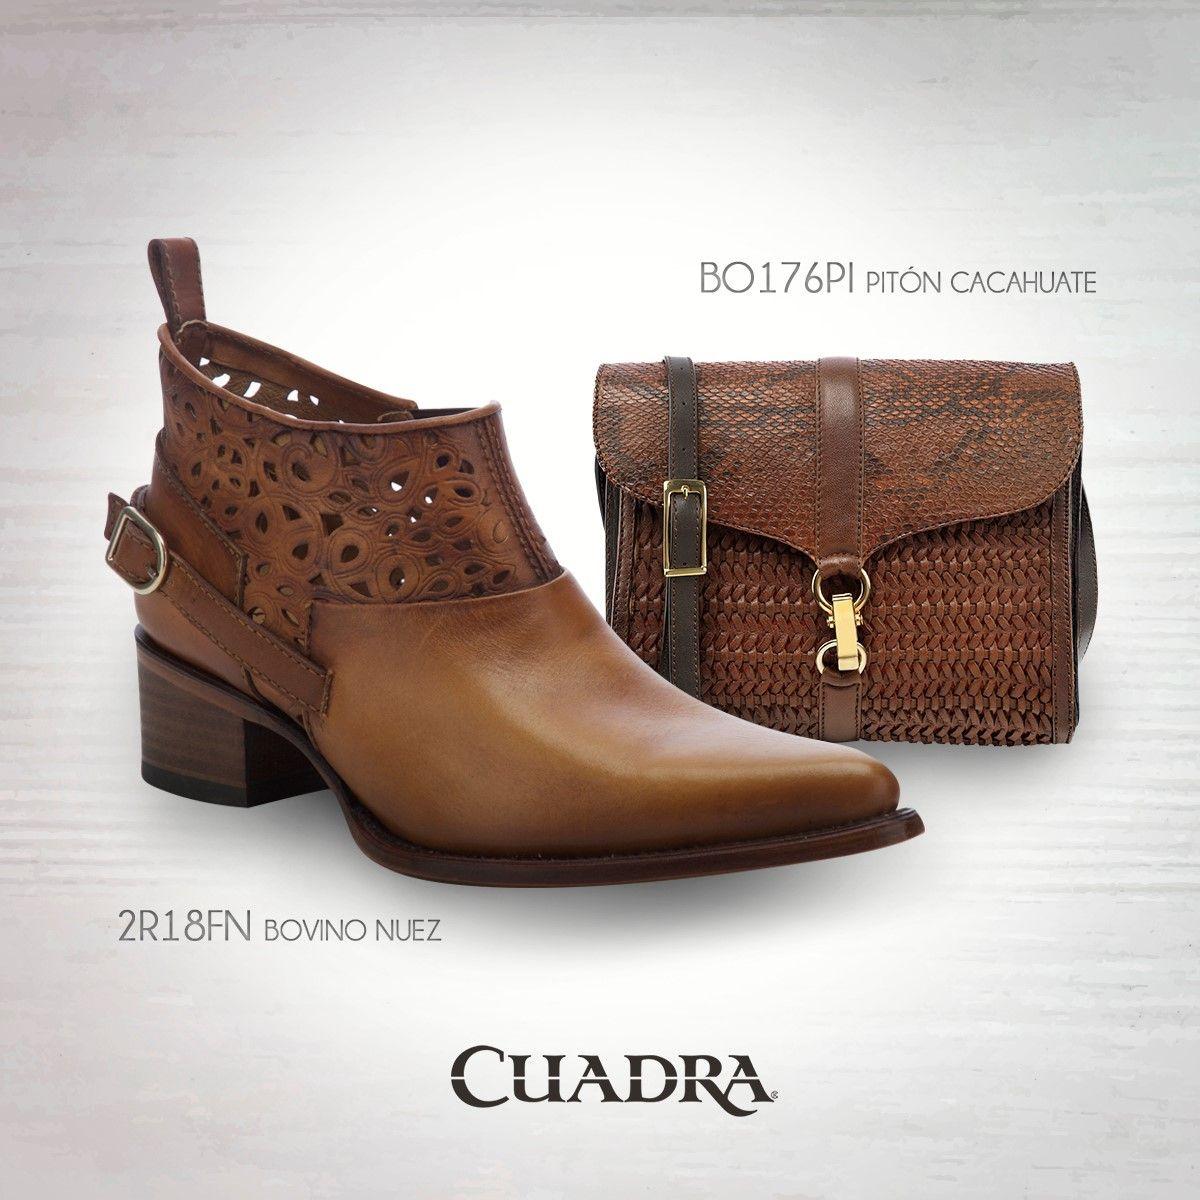 7f6d8d49 Un #bolso #CUADRA es tu mejor aliado. #Botines #Botas #Boots #Bags ...